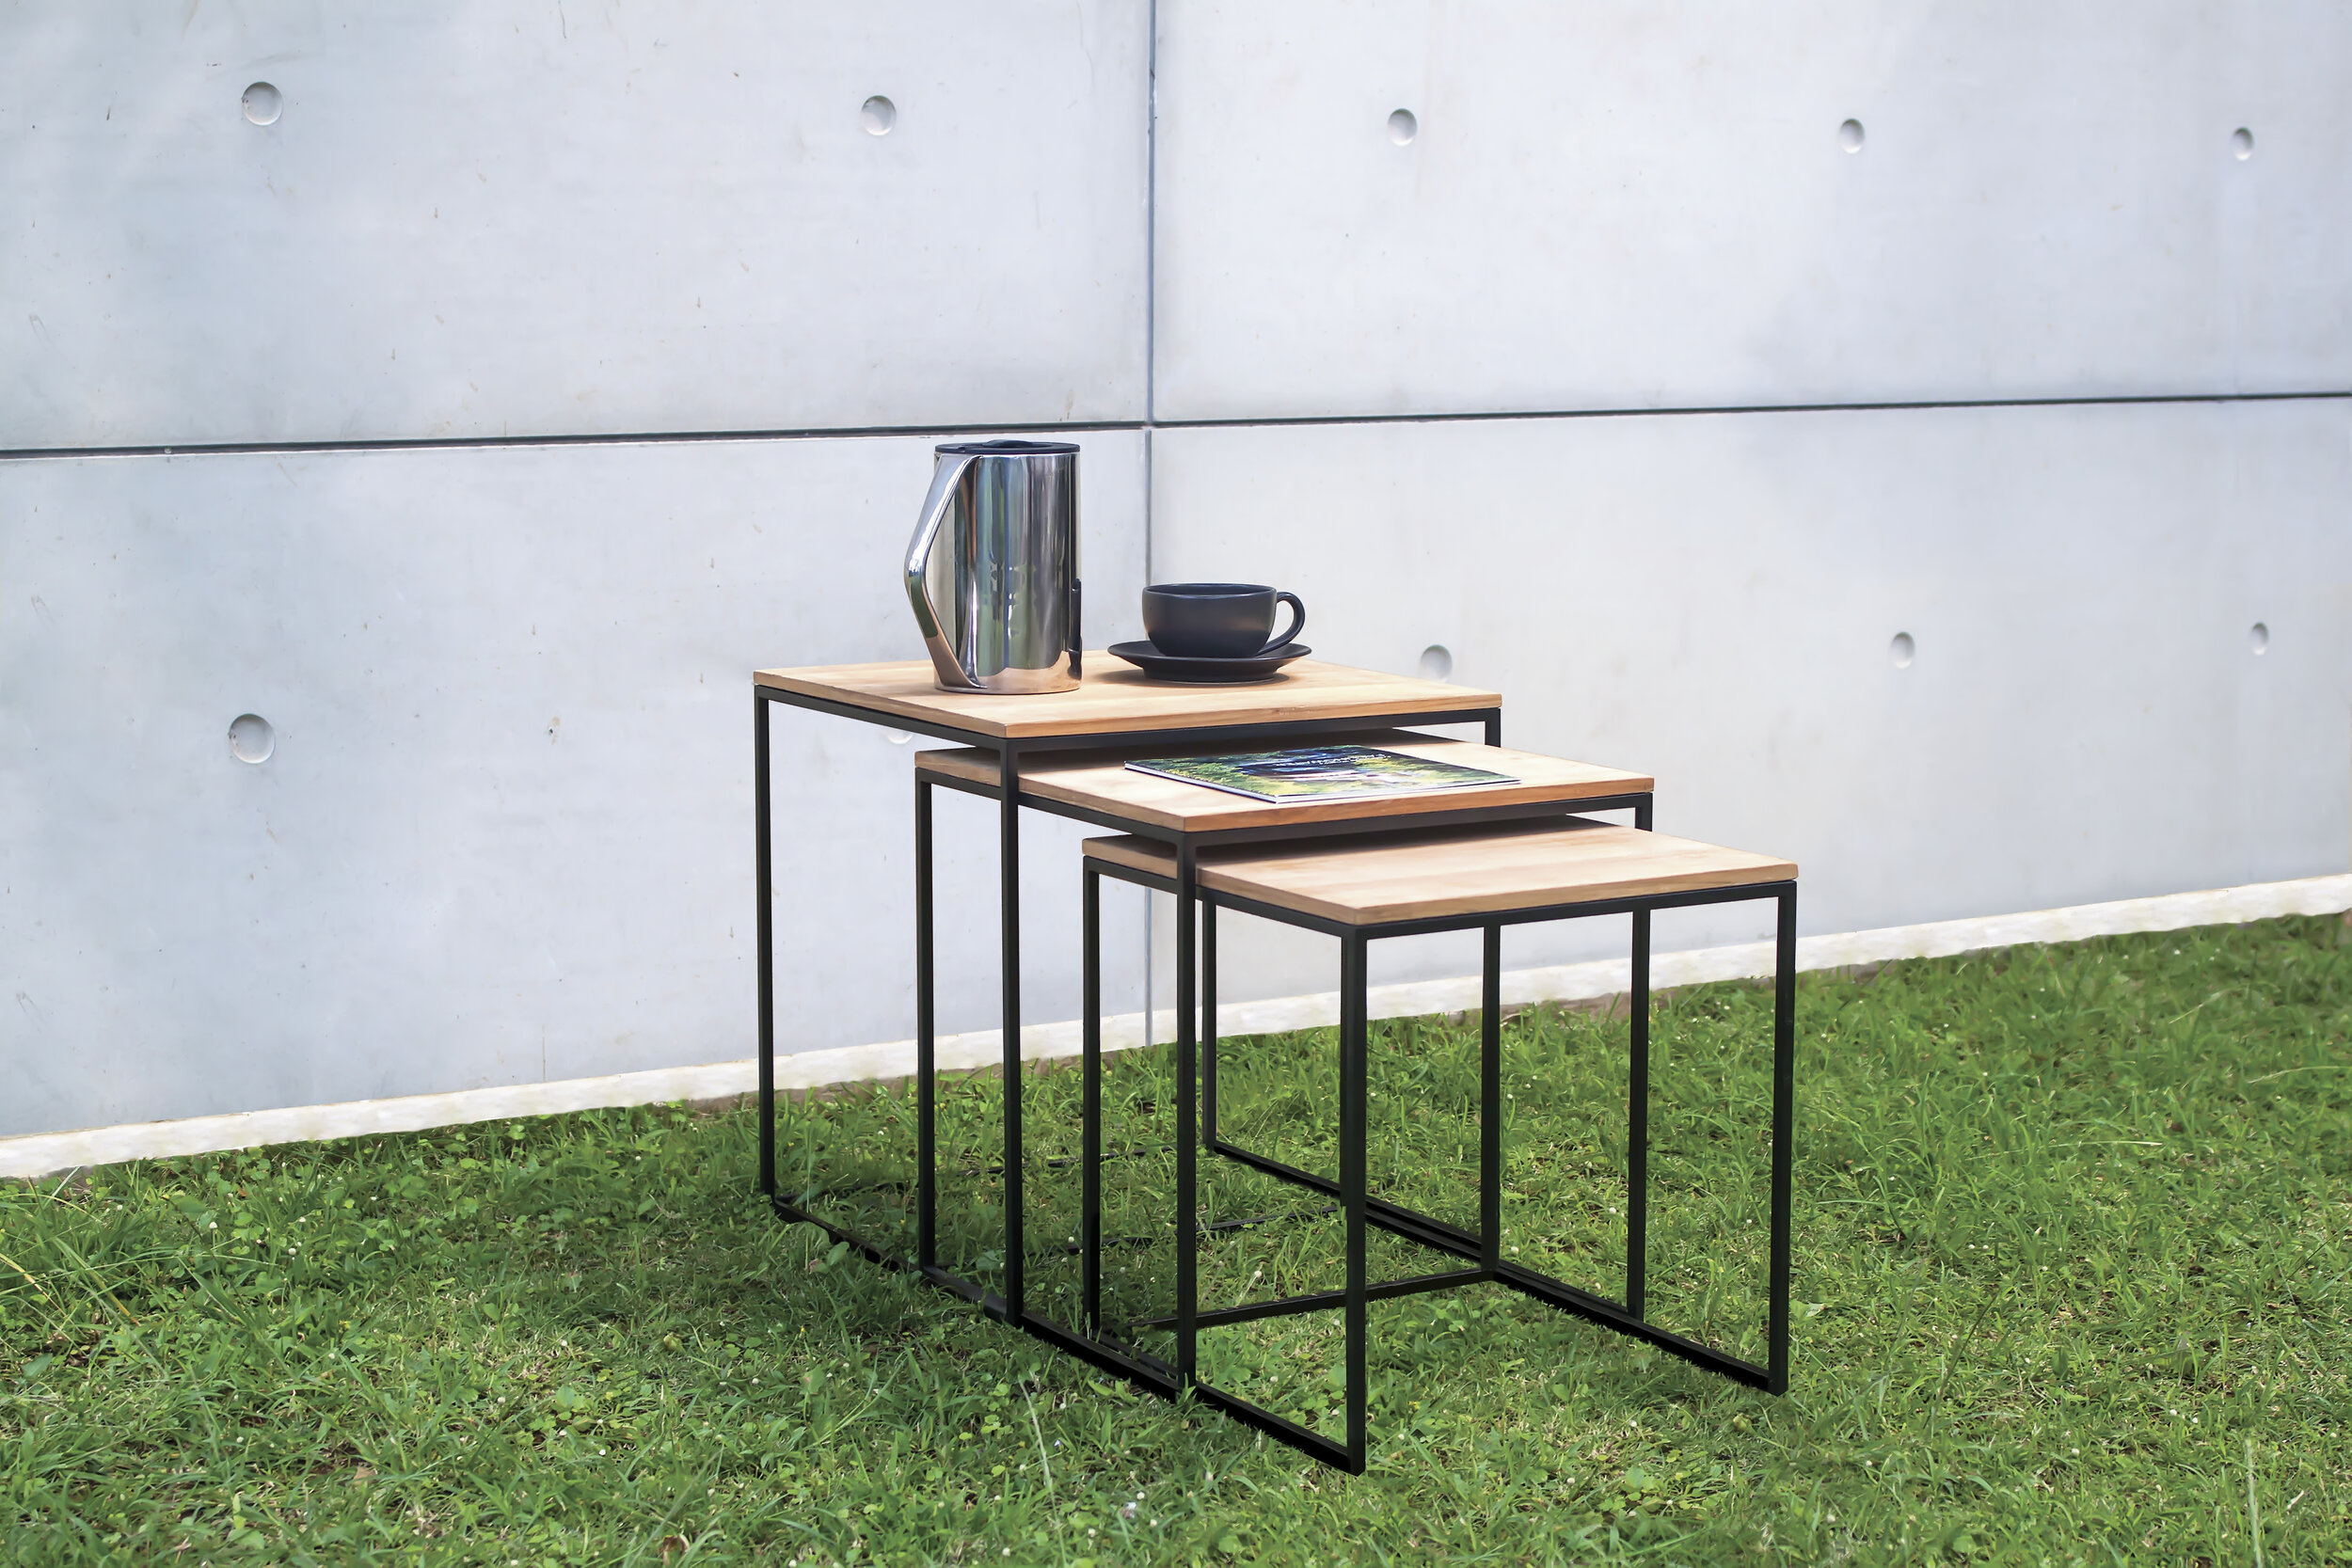 ELEMENTS - Designed by Danish designer Povl Eskildsen